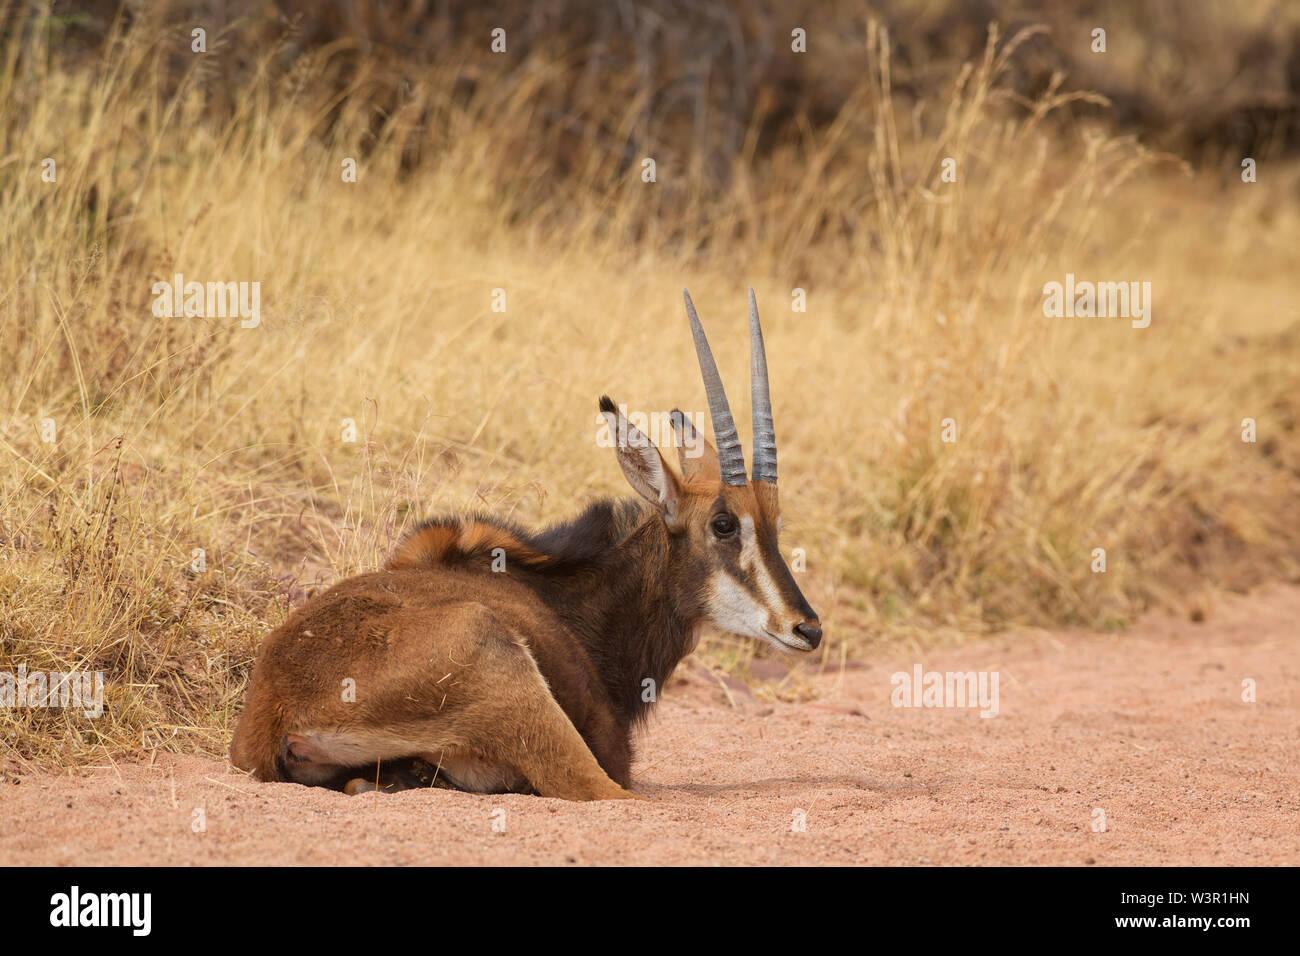 Sable Antelope - Hippotragus niger, bellissimo grande antilope da savane africane e cespugli, Namibia. Foto Stock